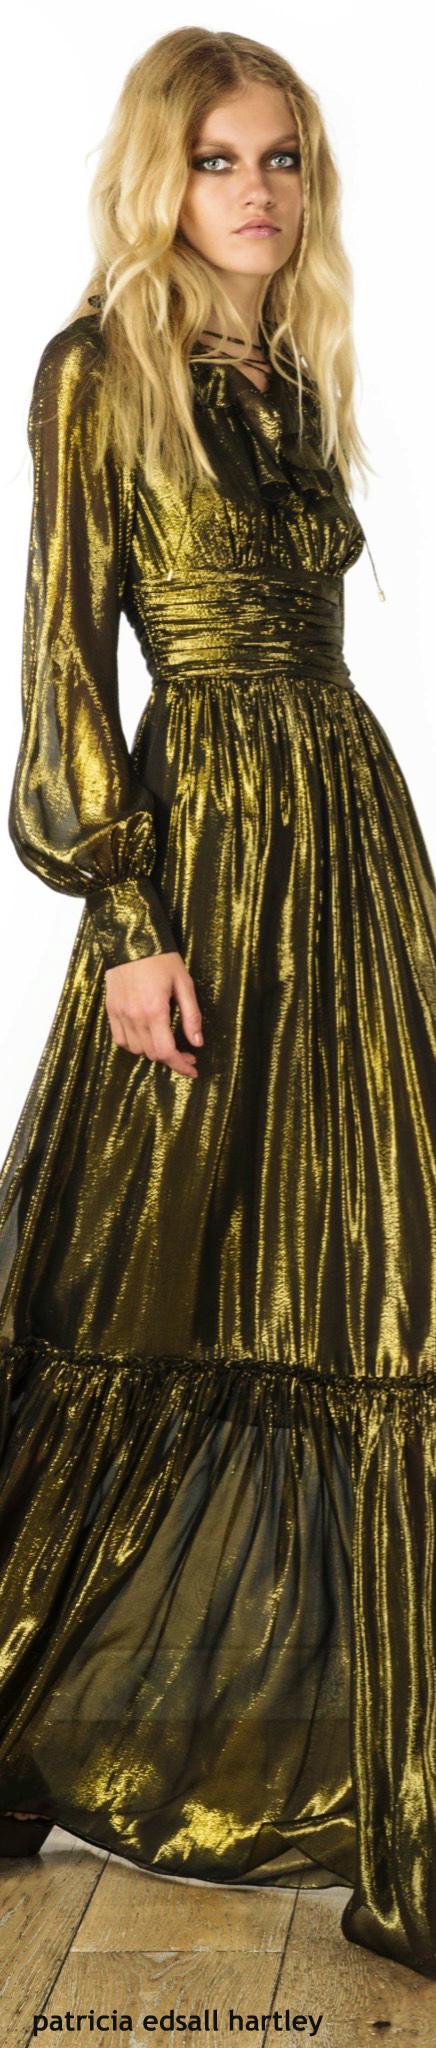 Fyne Girlz regarding pinm j on kendra kouture   pinterest   eagle, curvy and clothes